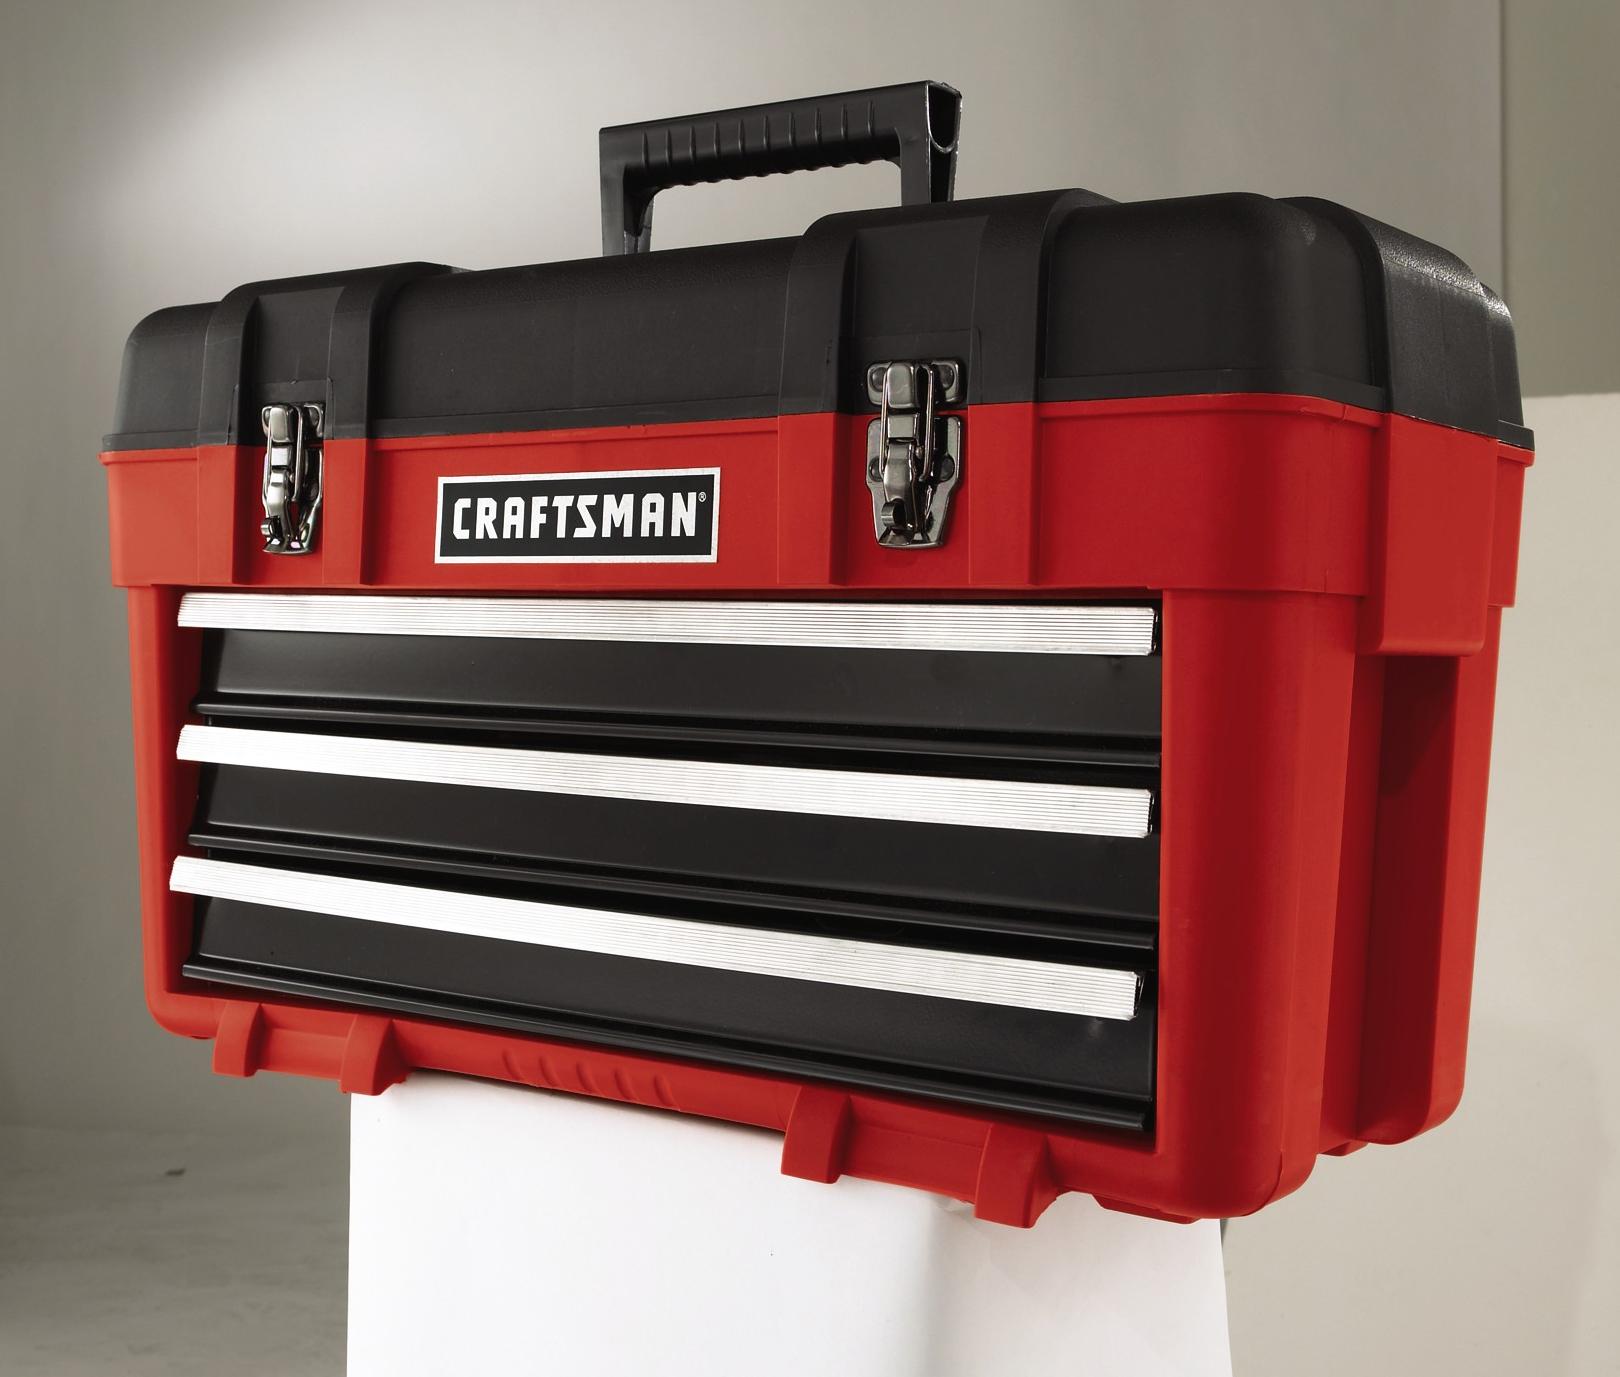 Craftsman 3-Drawer Plastic/Metal Portable Chest - Red/Black